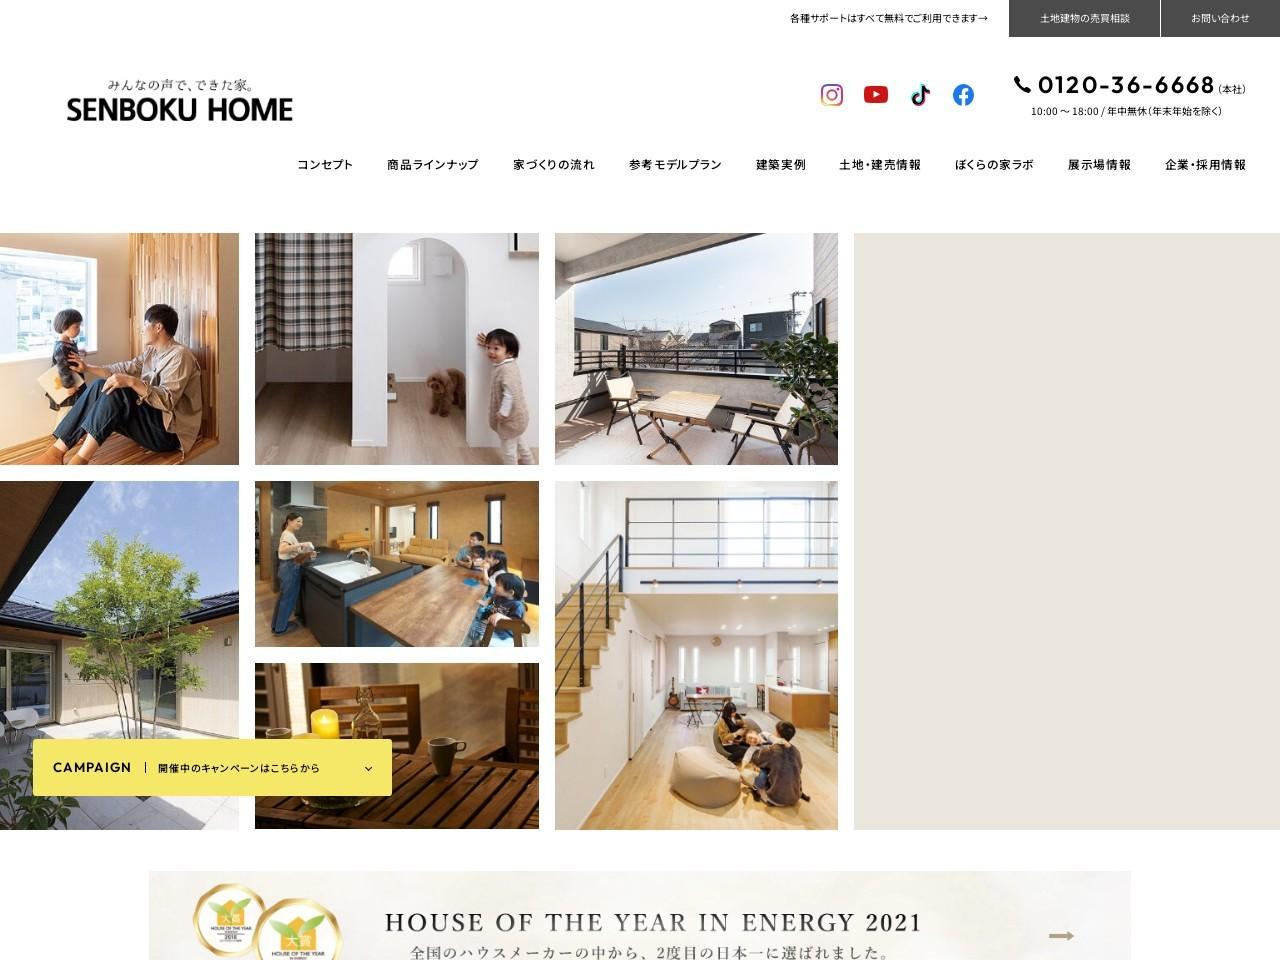 泉北ホーム株式会社